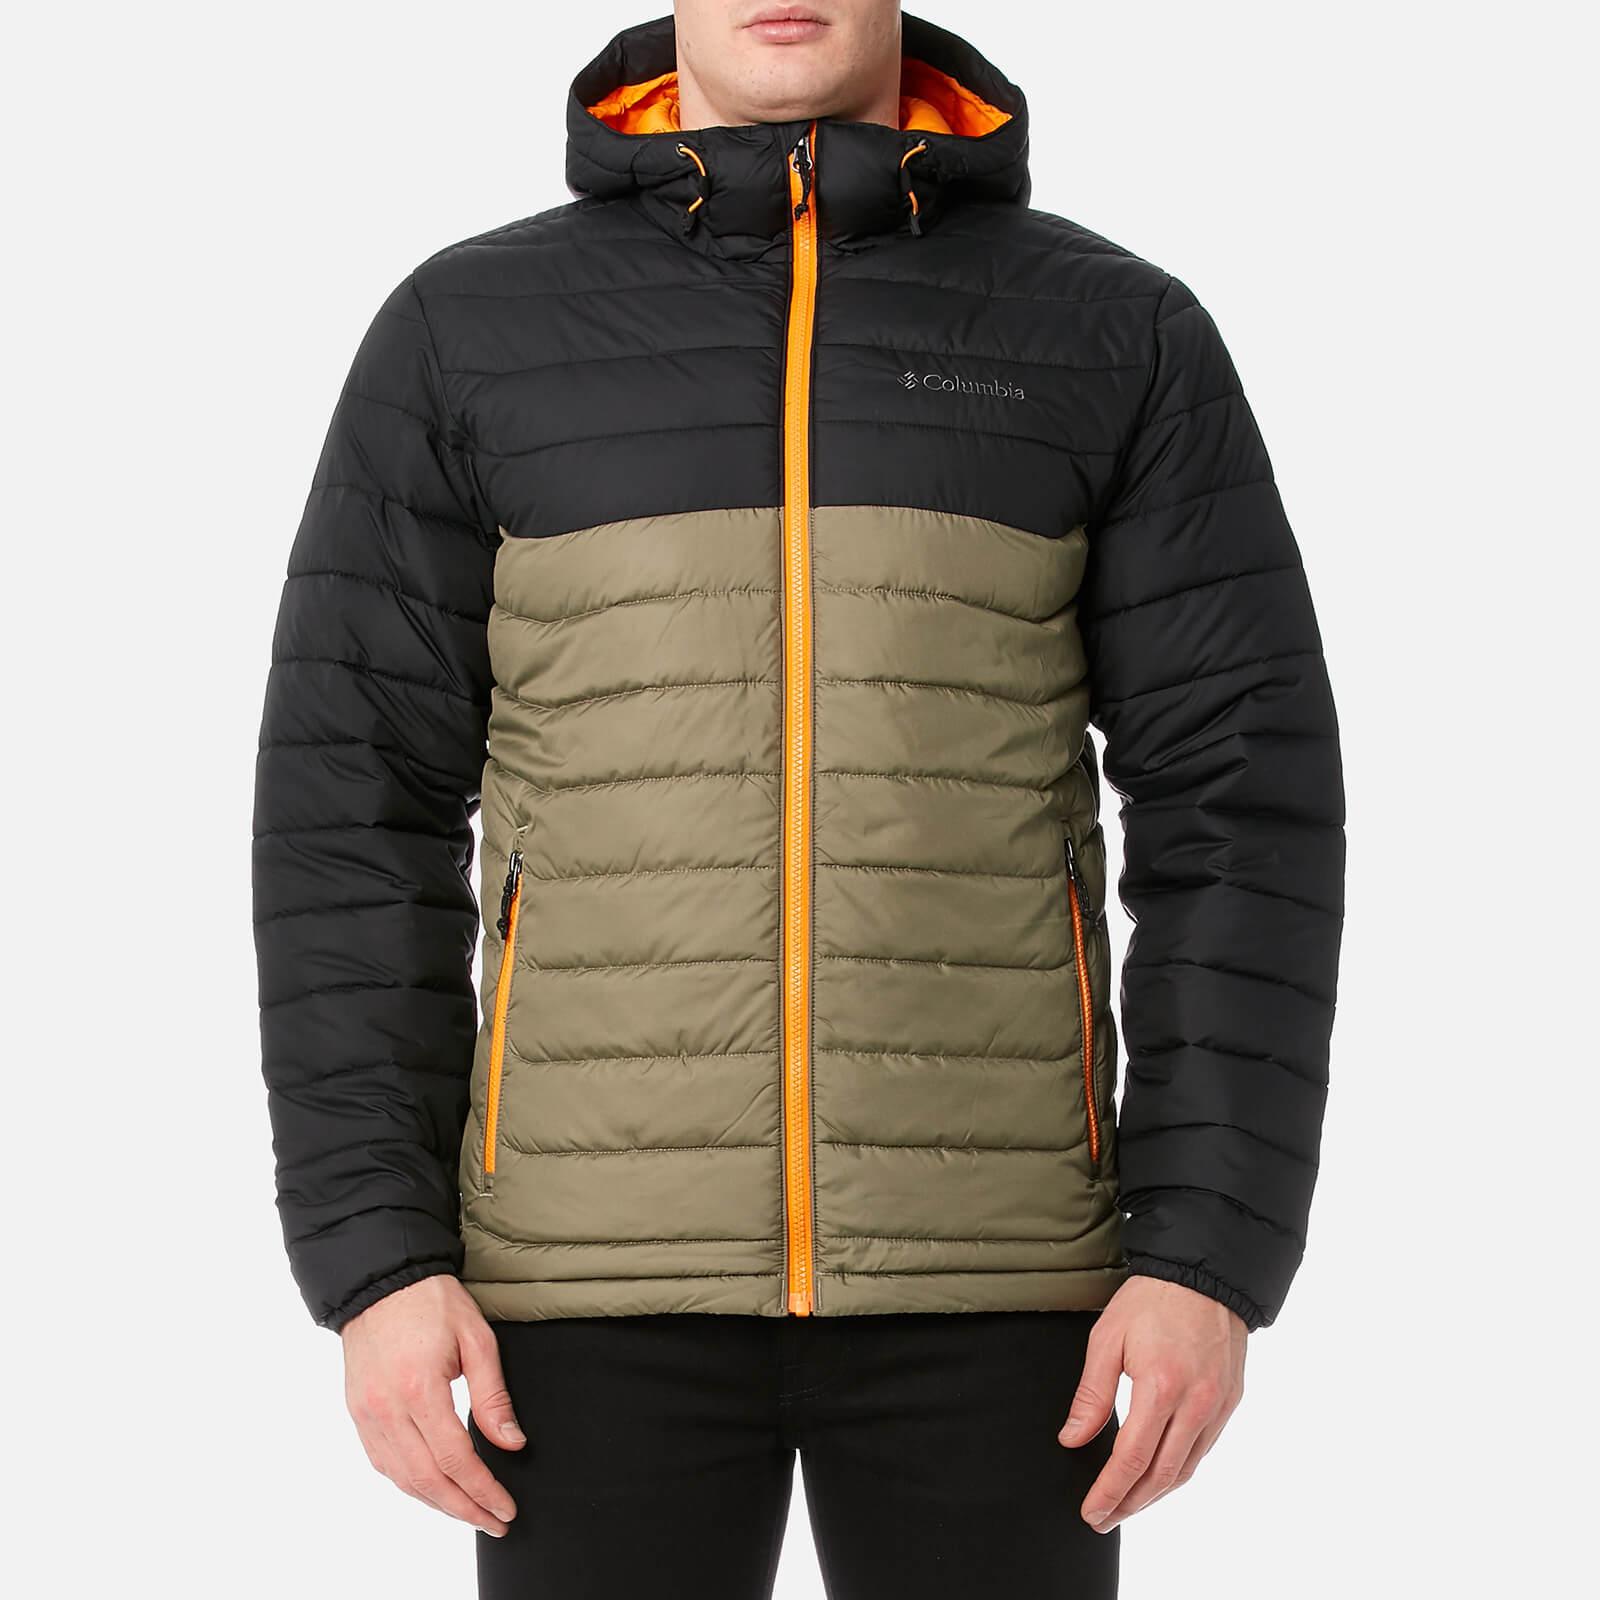 c149db35f Columbia Men's Powder Lite Hooded Jacket - Sage/Black/Solarize